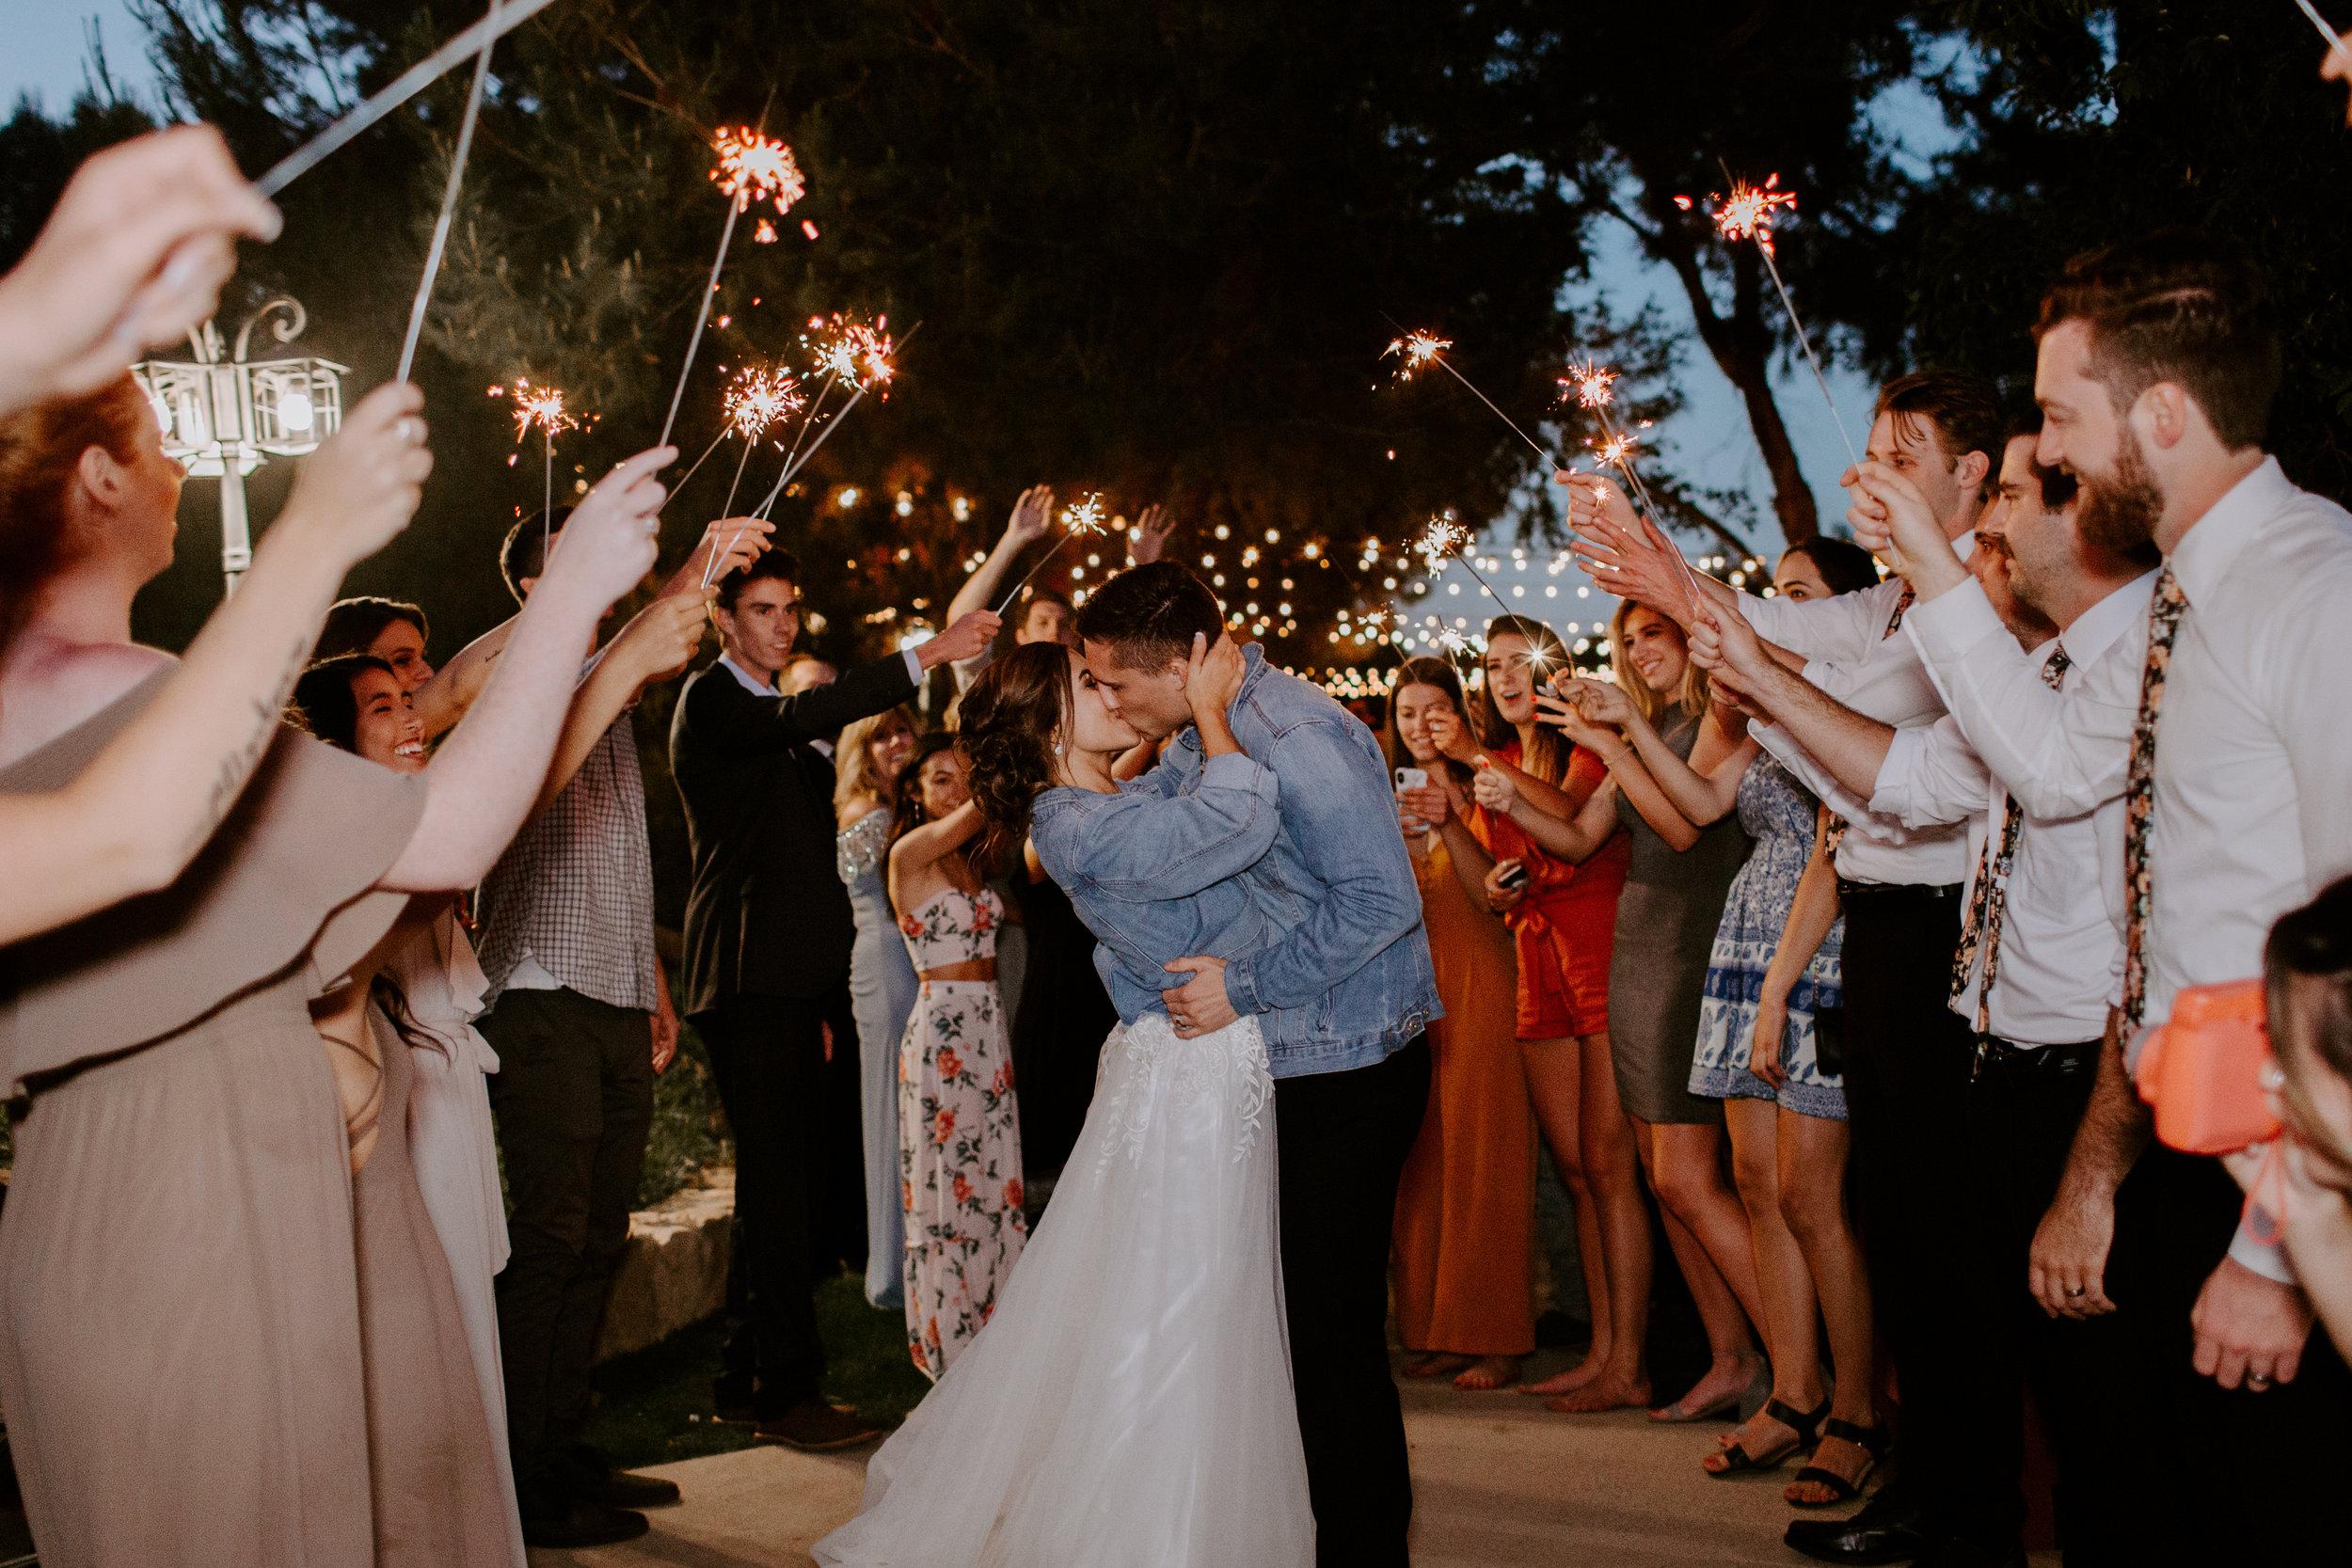 kate+zack_wedding_secludedgardenestate_temecula_madisonrylee_1510.jpg